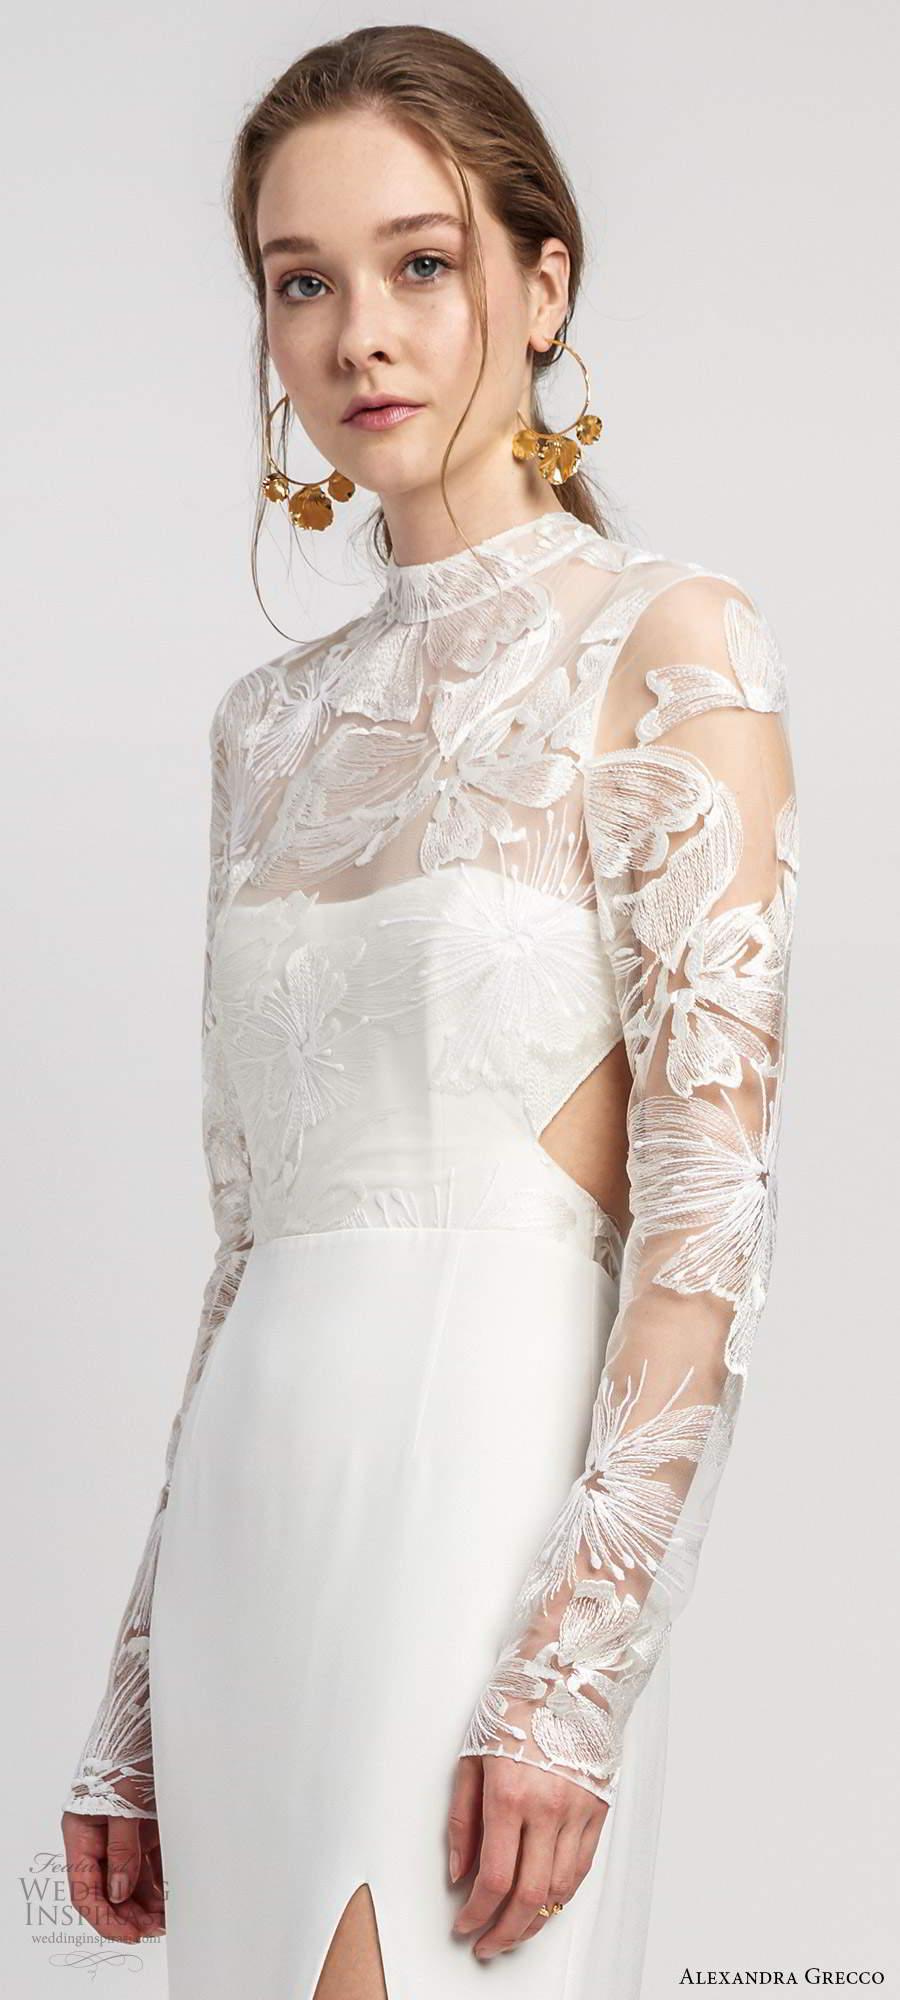 alexandra grecco 2020 bridal illusion long sleeves sheer high necklinge embellished lace bodice sheath wedding dress slit skirt cutout back cathedral train (4) zv